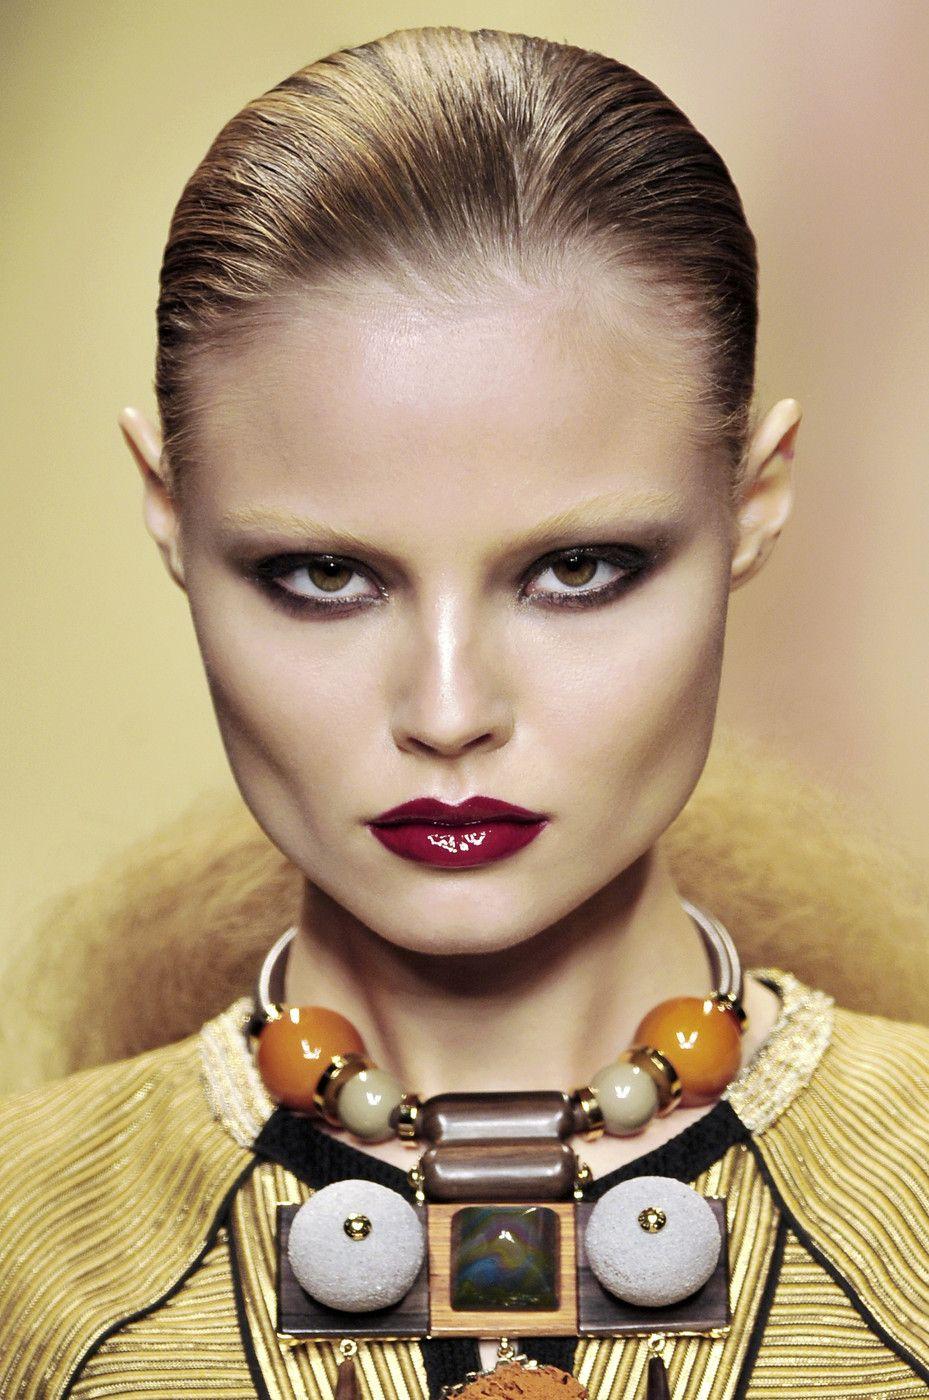 Magdalena frackowiak louis vuitton fw 2009 fashion show in paris hq runway candids nude (34 pics)